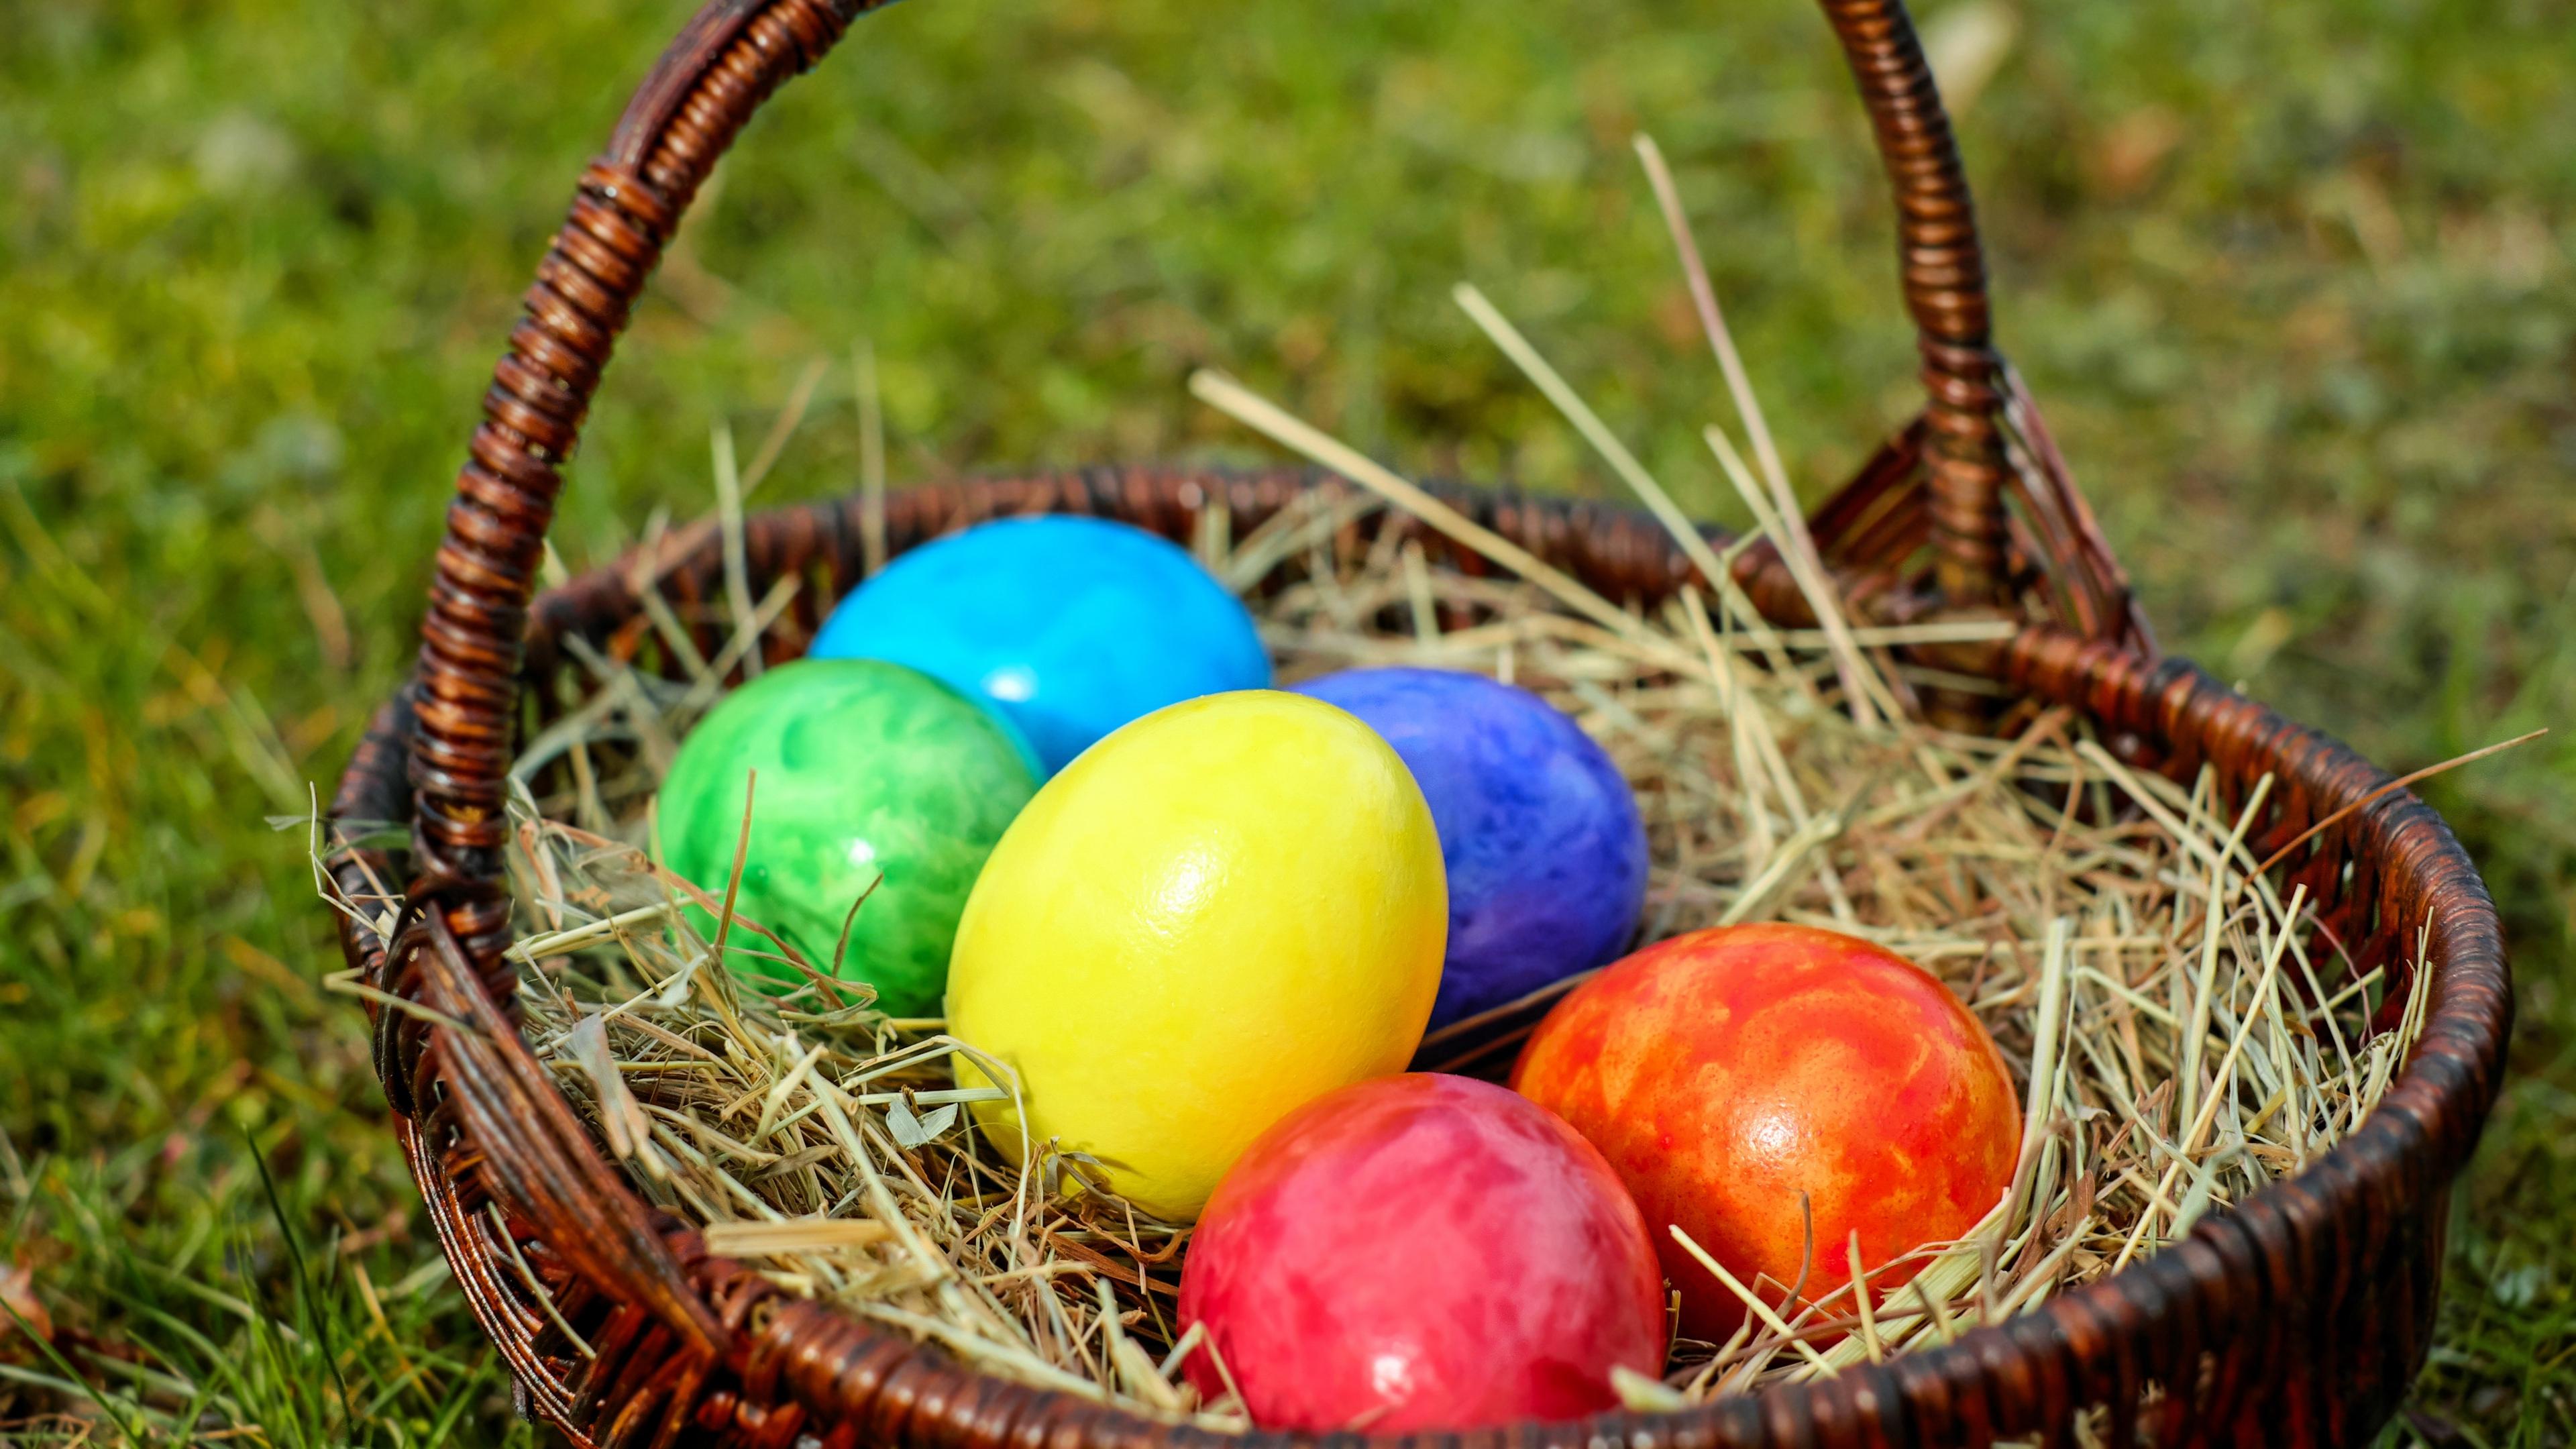 eggs easter basket hay 4k 1538344670 - eggs, easter, basket, hay 4k - Eggs, Easter, Basket